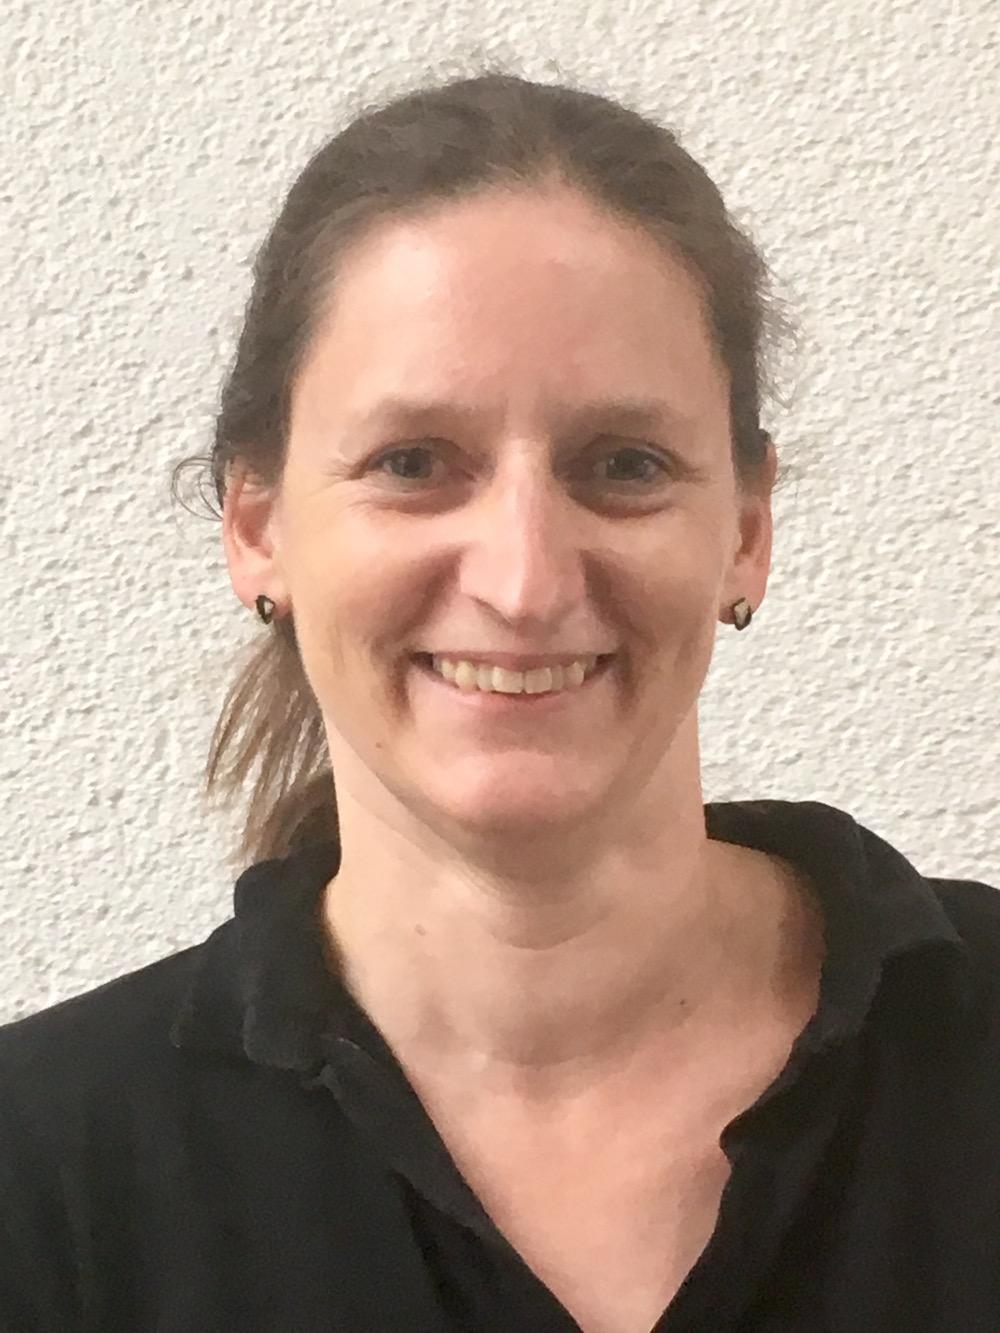 Carli Hoffmann